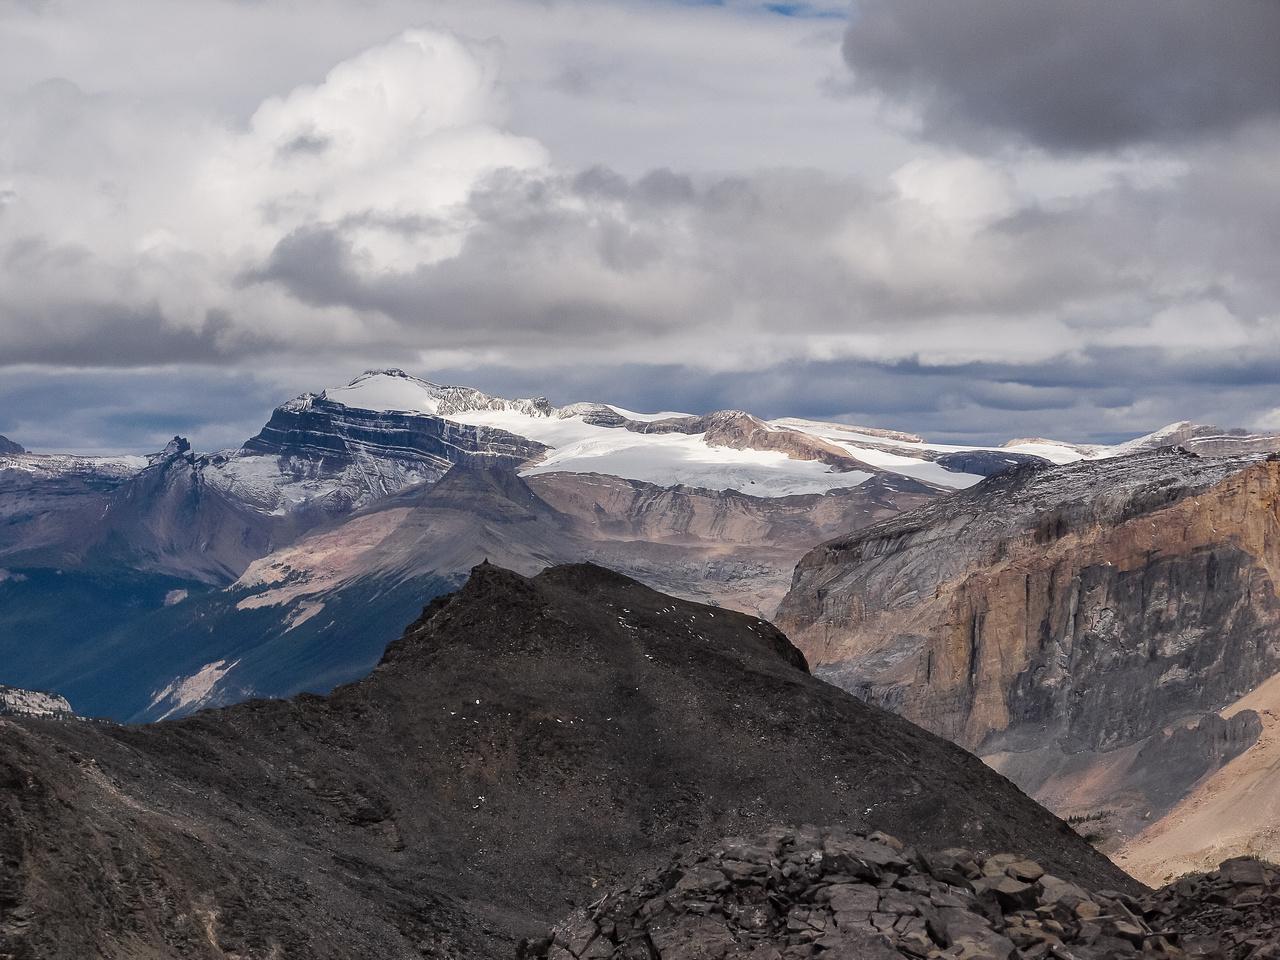 Mount Balfour rises over Walcott Peak.